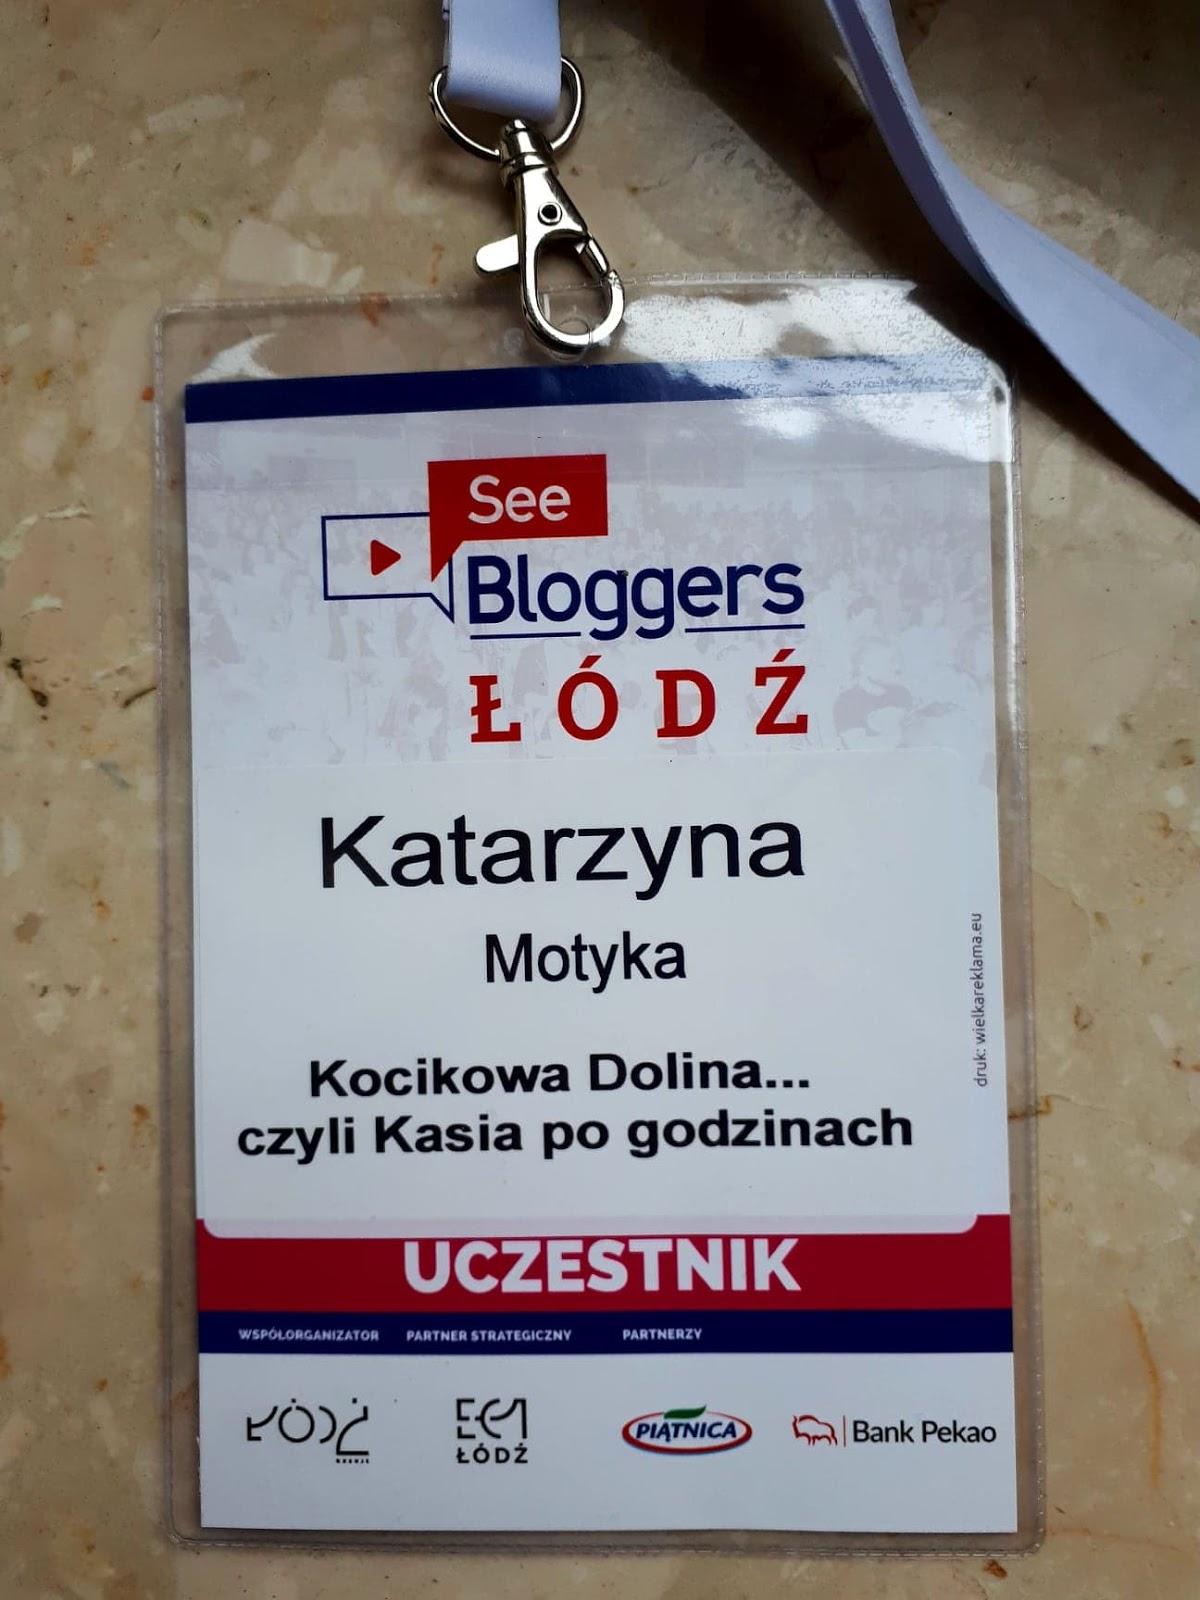 See Blogers - relacja subiektywna